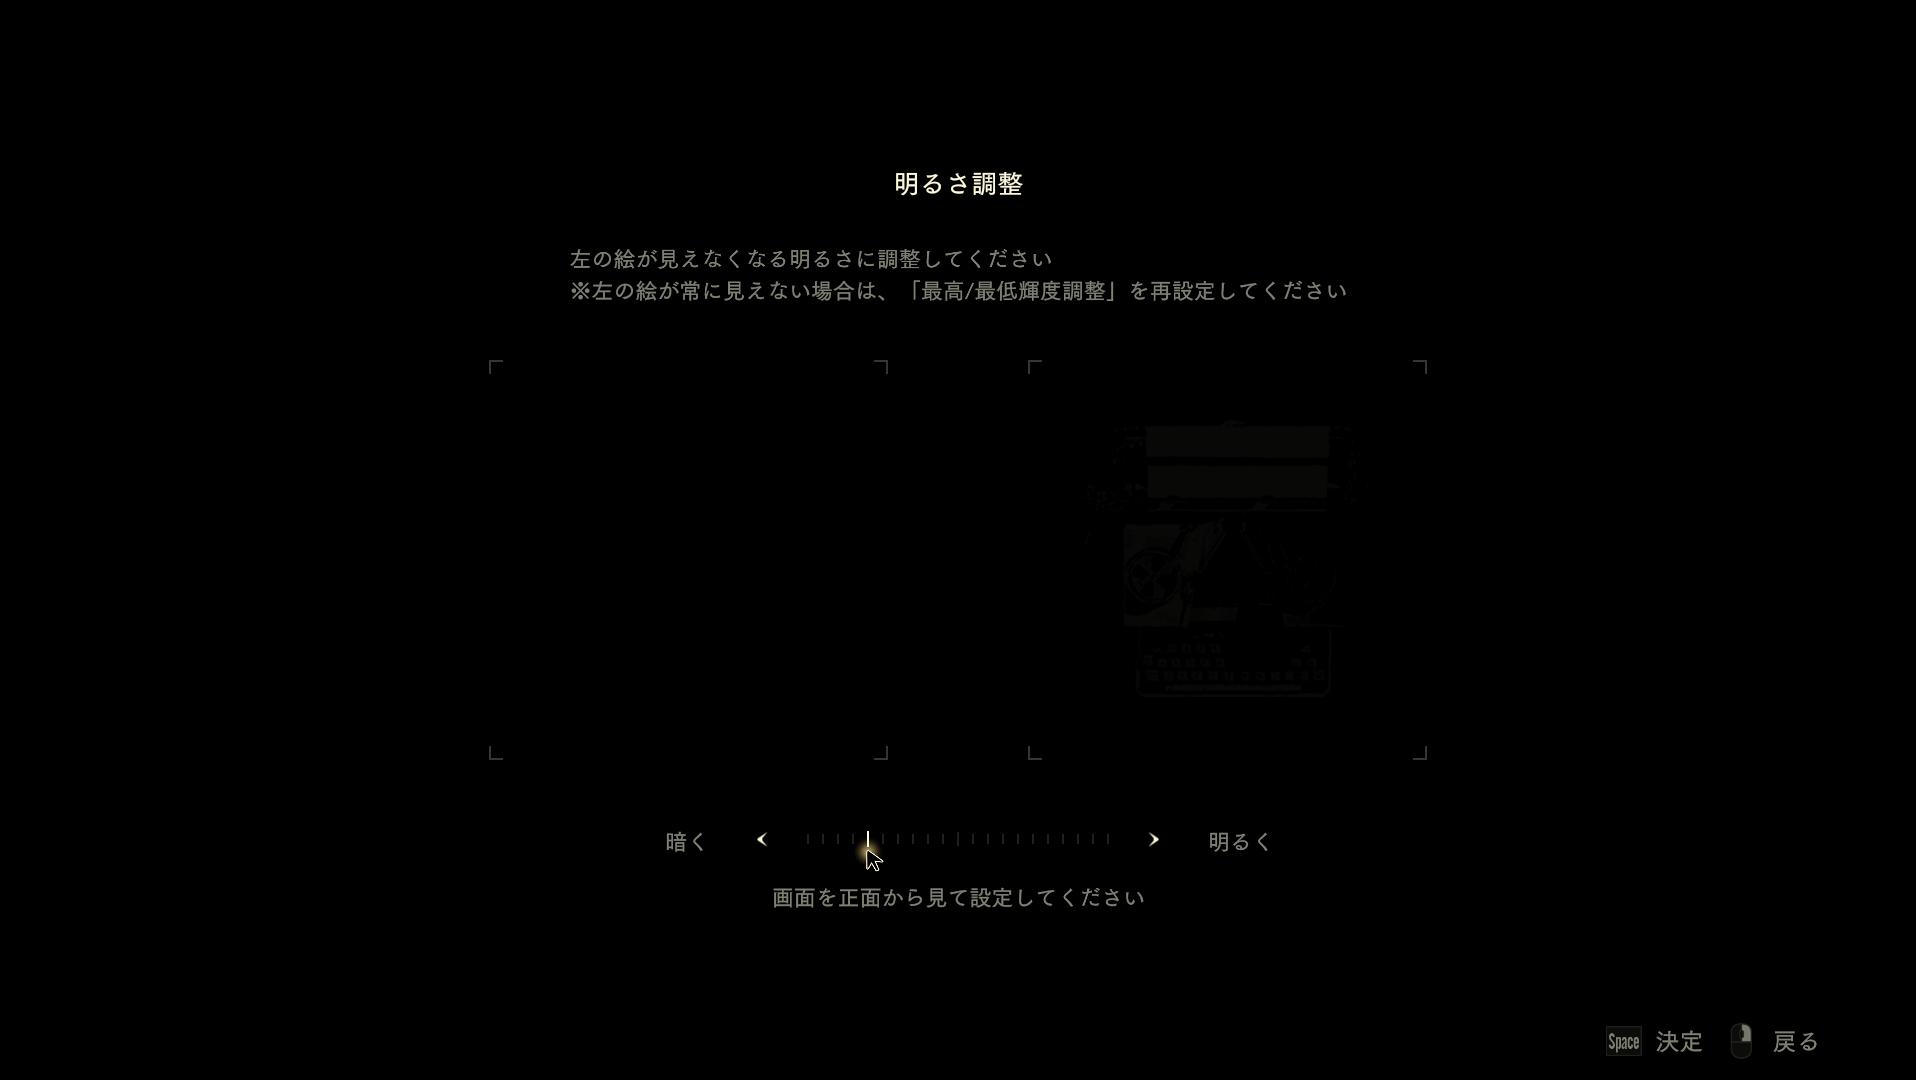 Steam 版 バイオハザード RE:2 色空間・明るさ設定の違い、色空間 sRGB 用、明るさ調整 一番暗い設定から目盛りを 4段階上げる(一番左端目盛りから右 4目盛り移動)